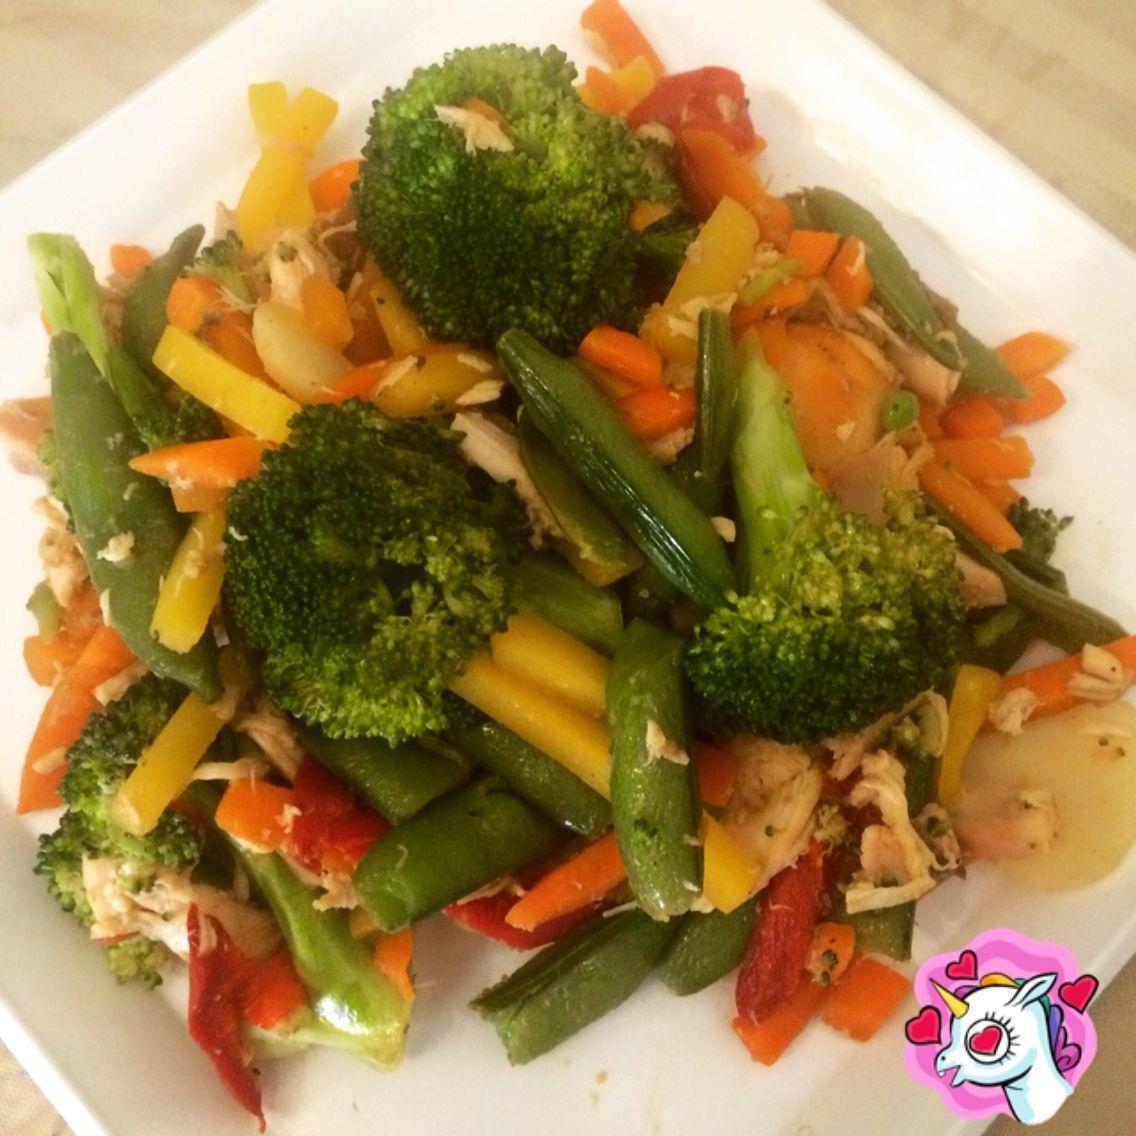 Pollo asado desmelusado con vegetales al vapor